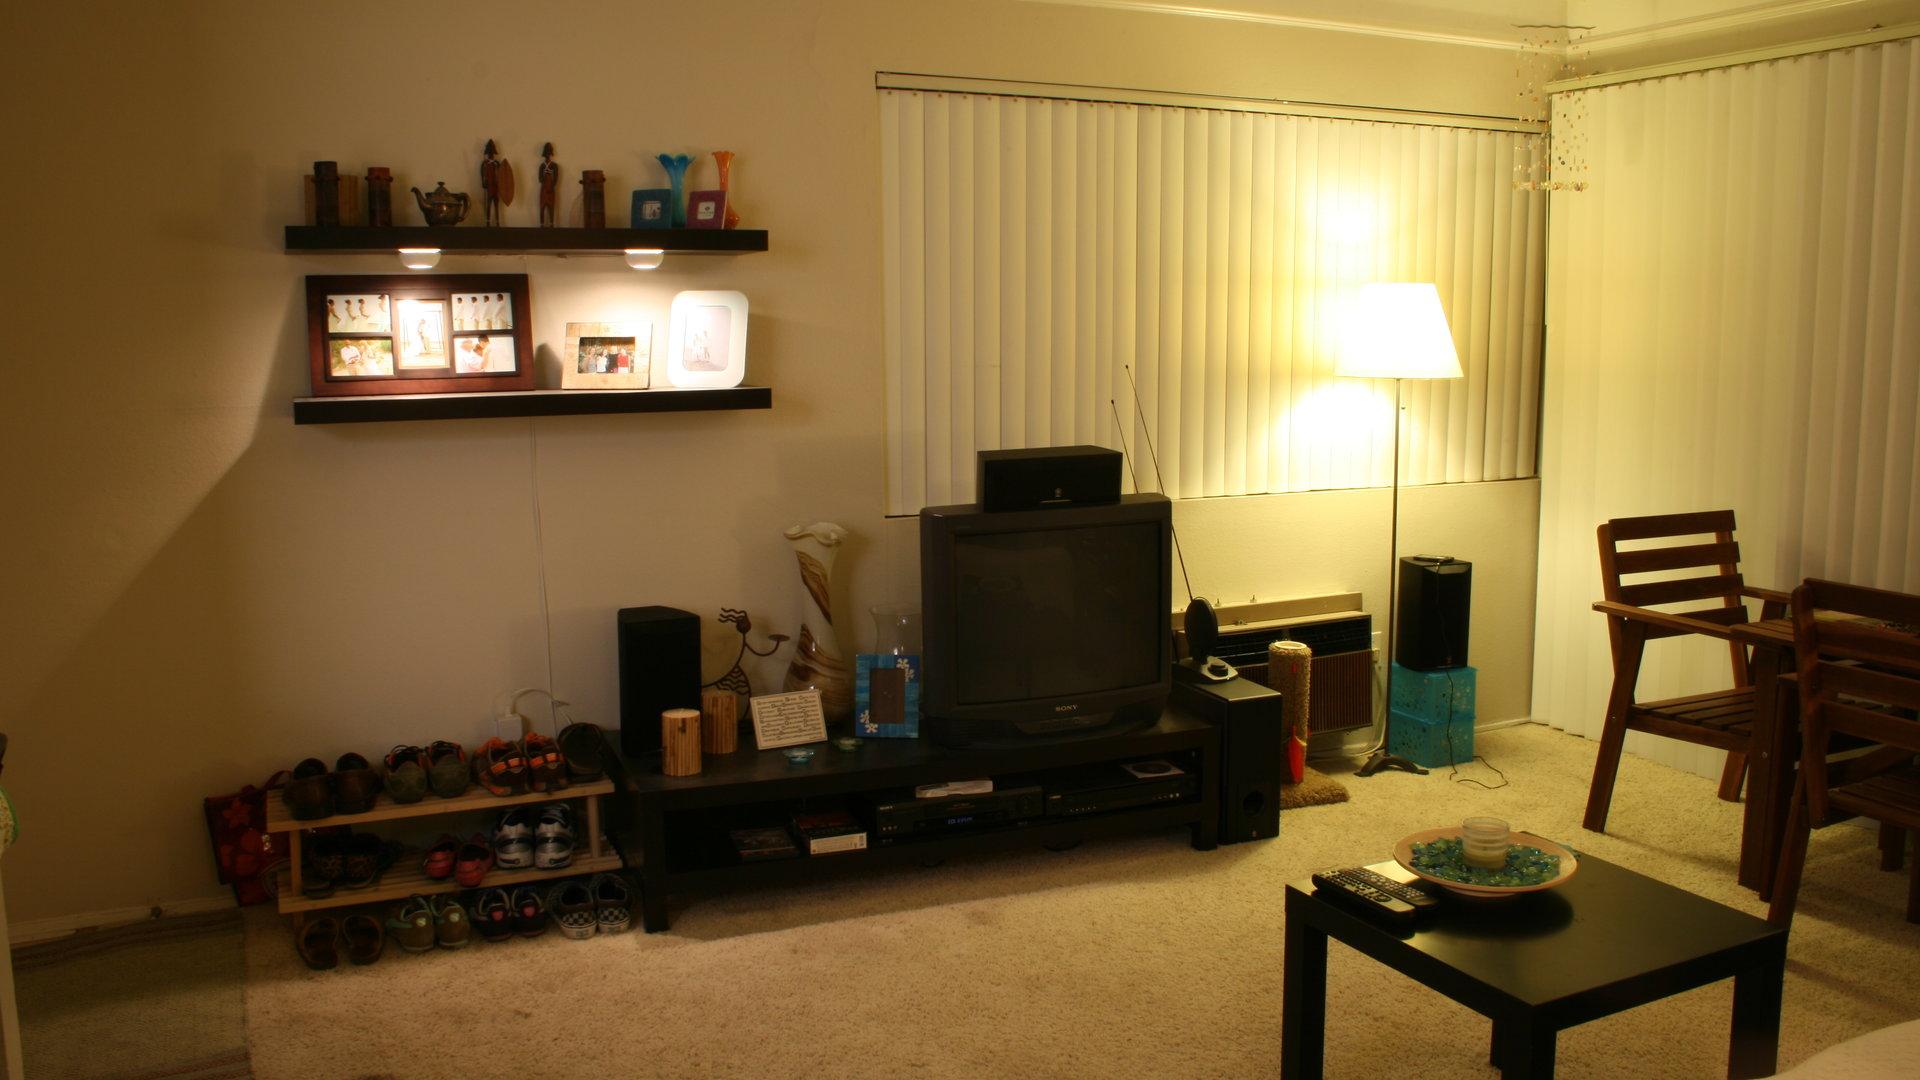 159 Apartments for Rent in Santa Ana, CA | ApartmentRatings©